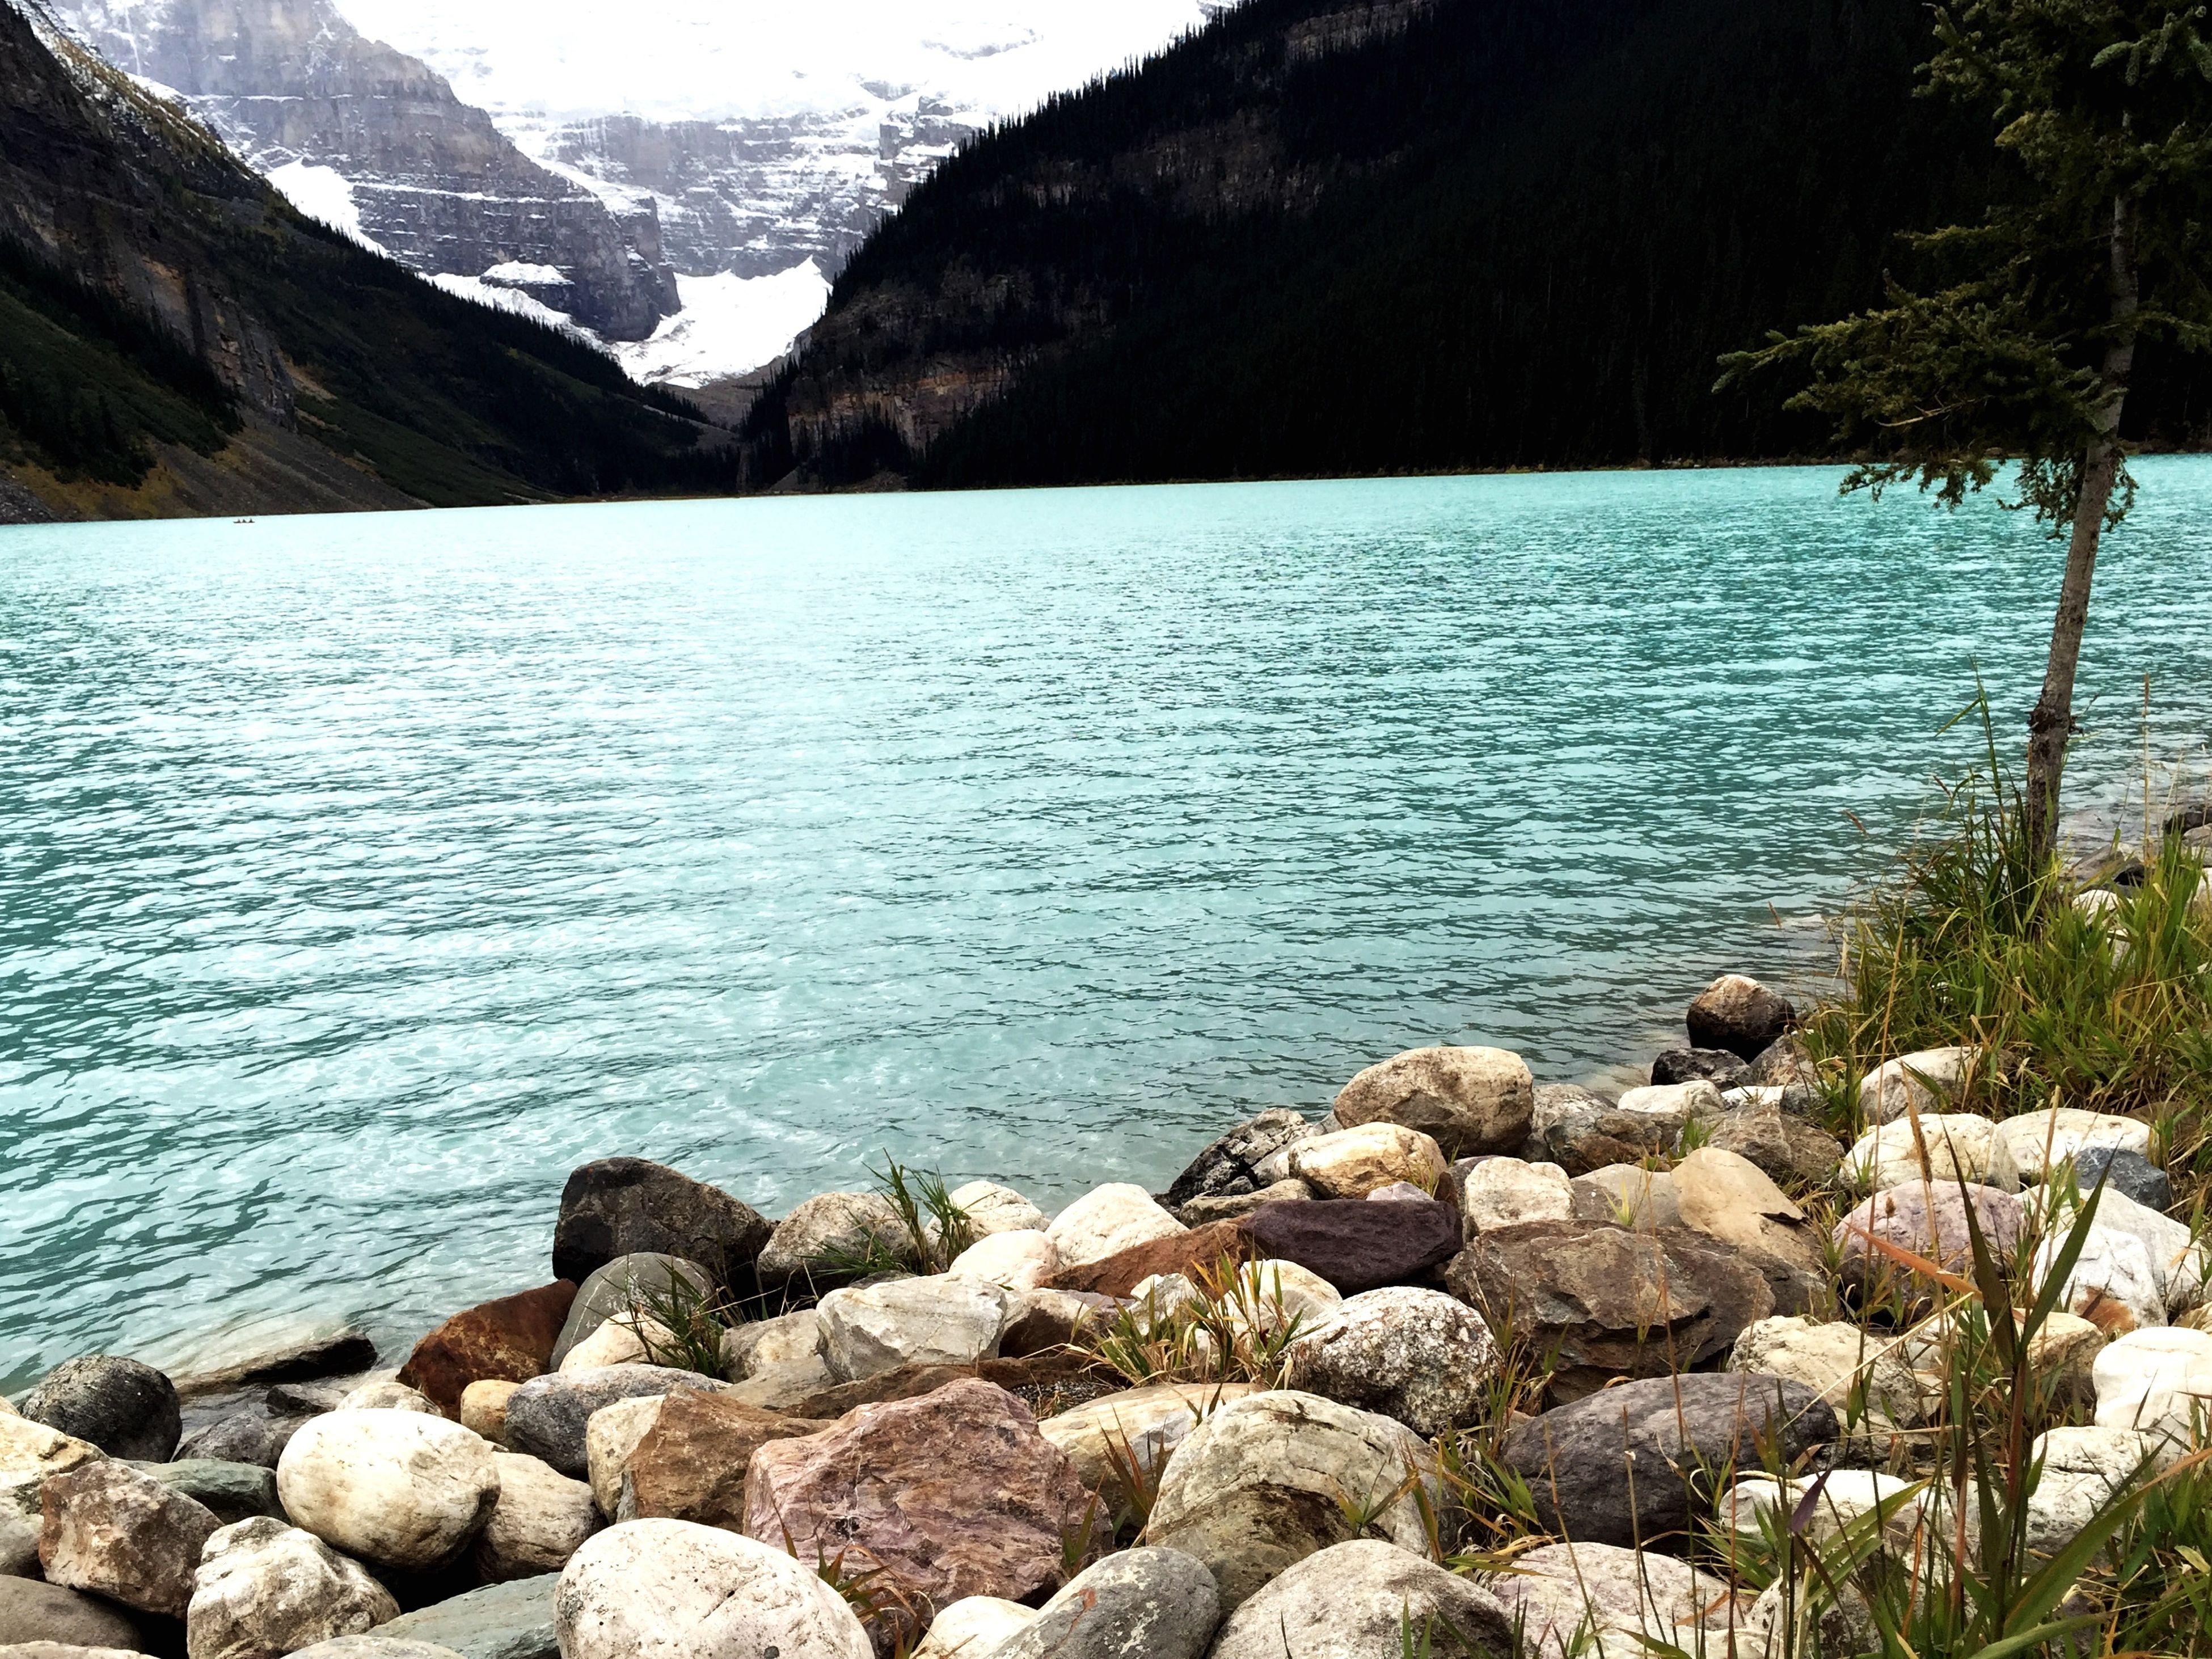 water, mountain, tranquil scene, tranquility, scenics, beauty in nature, lake, nature, rock - object, mountain range, idyllic, sky, stone - object, rock, non-urban scene, rippled, river, remote, day, non urban scene